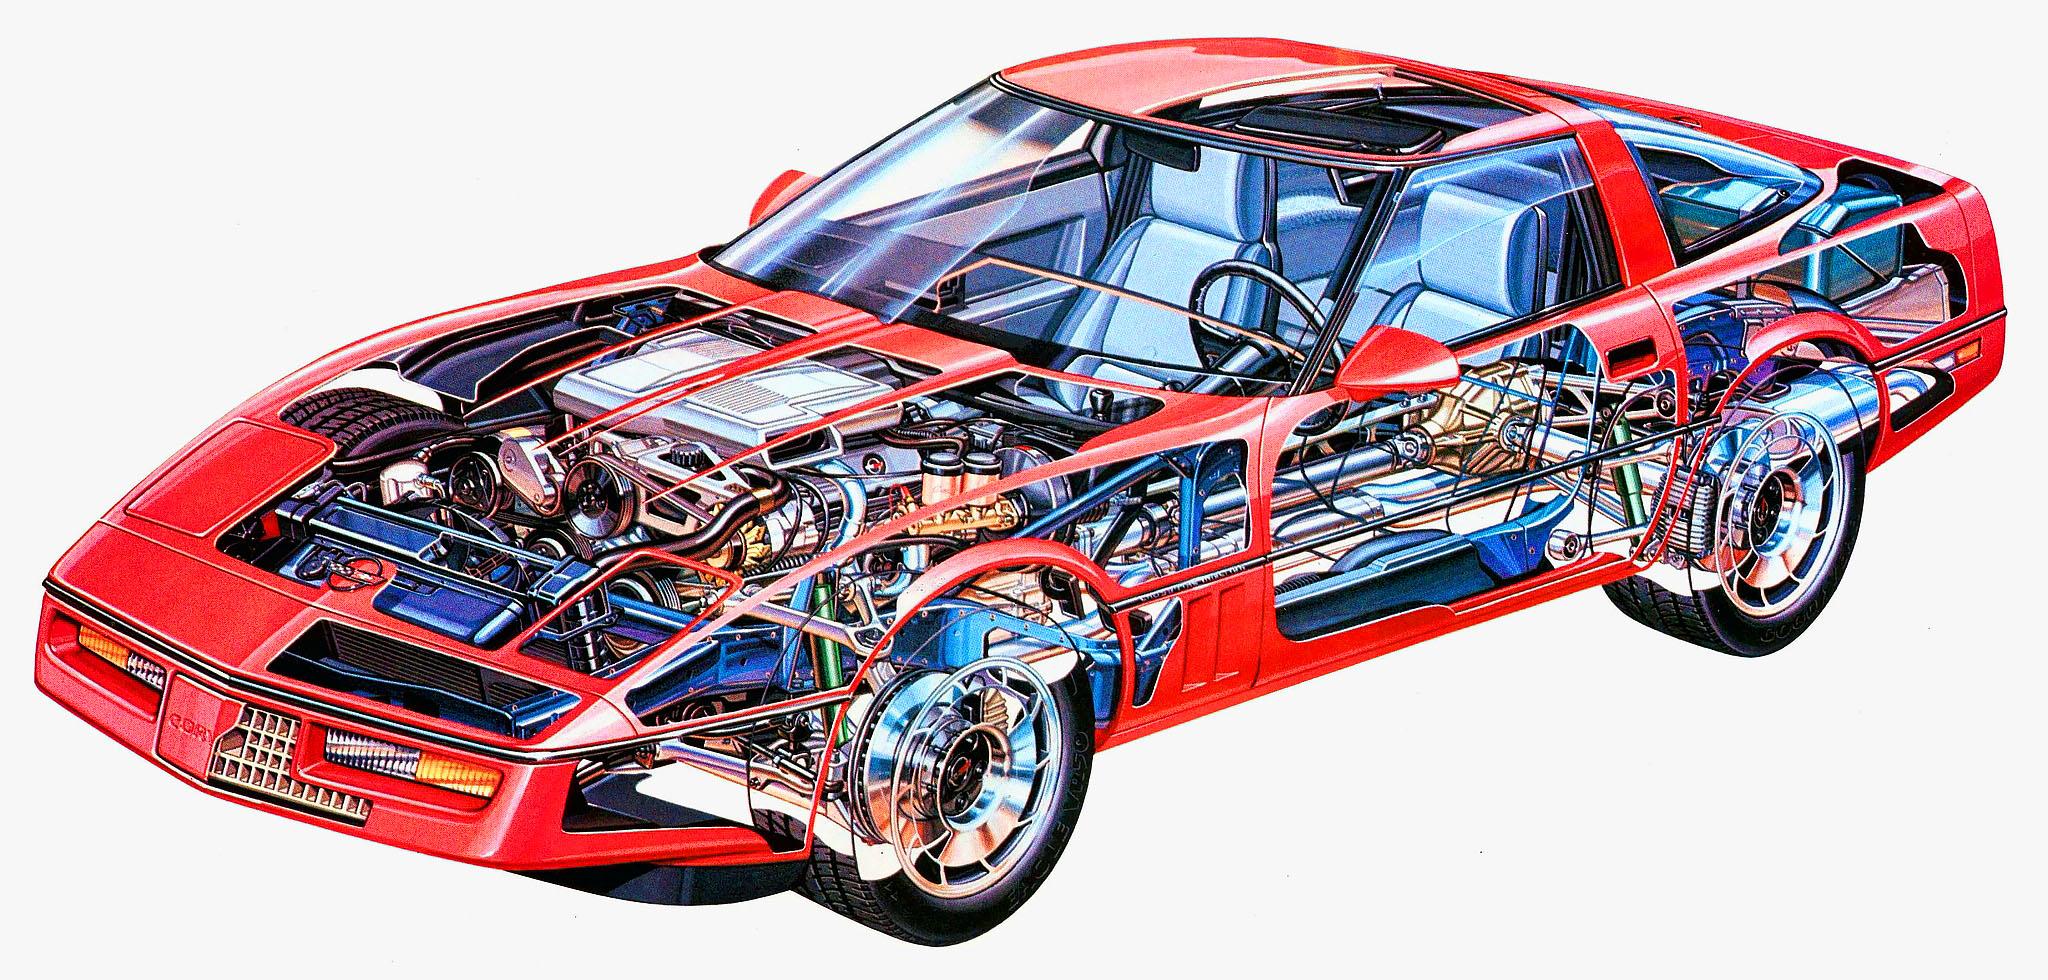 Corvette Coupe C4 1983 technic